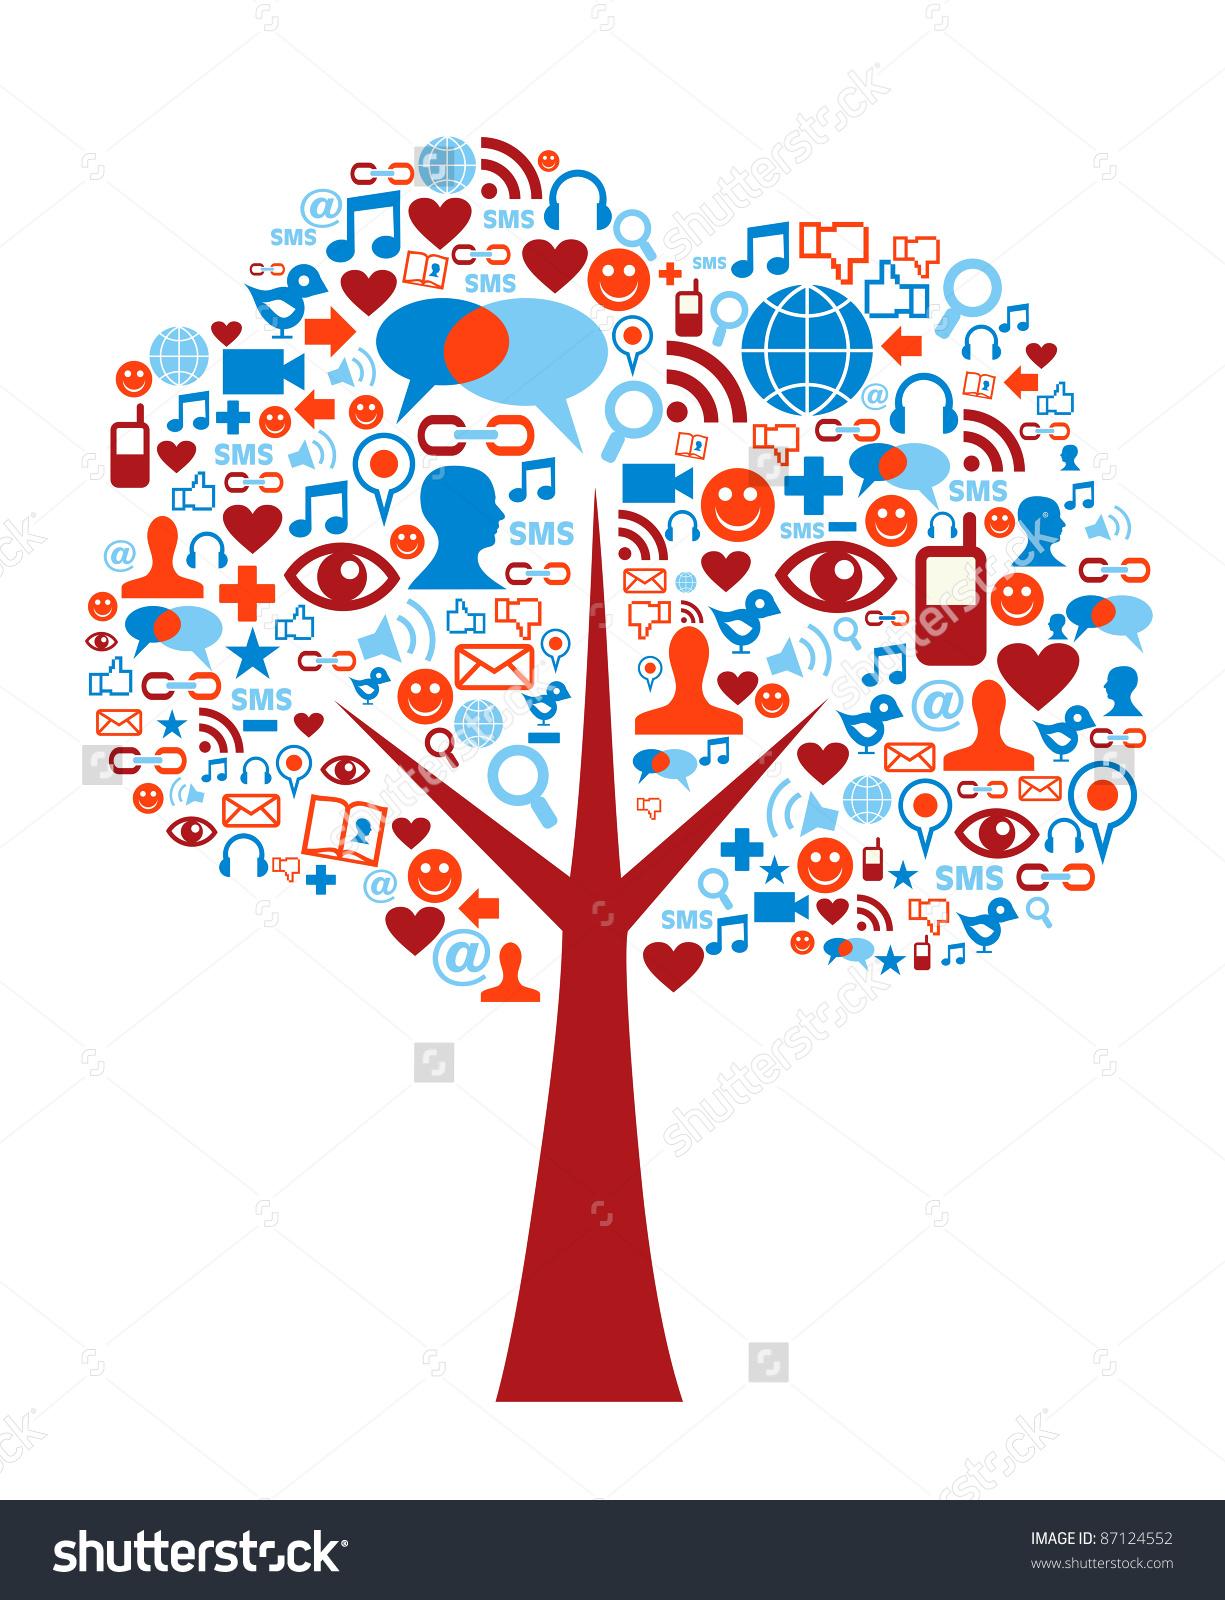 Social media clipart set image black and white stock Social Media Icons Set Tree Shape Stock Illustration 87124552 ... image black and white stock